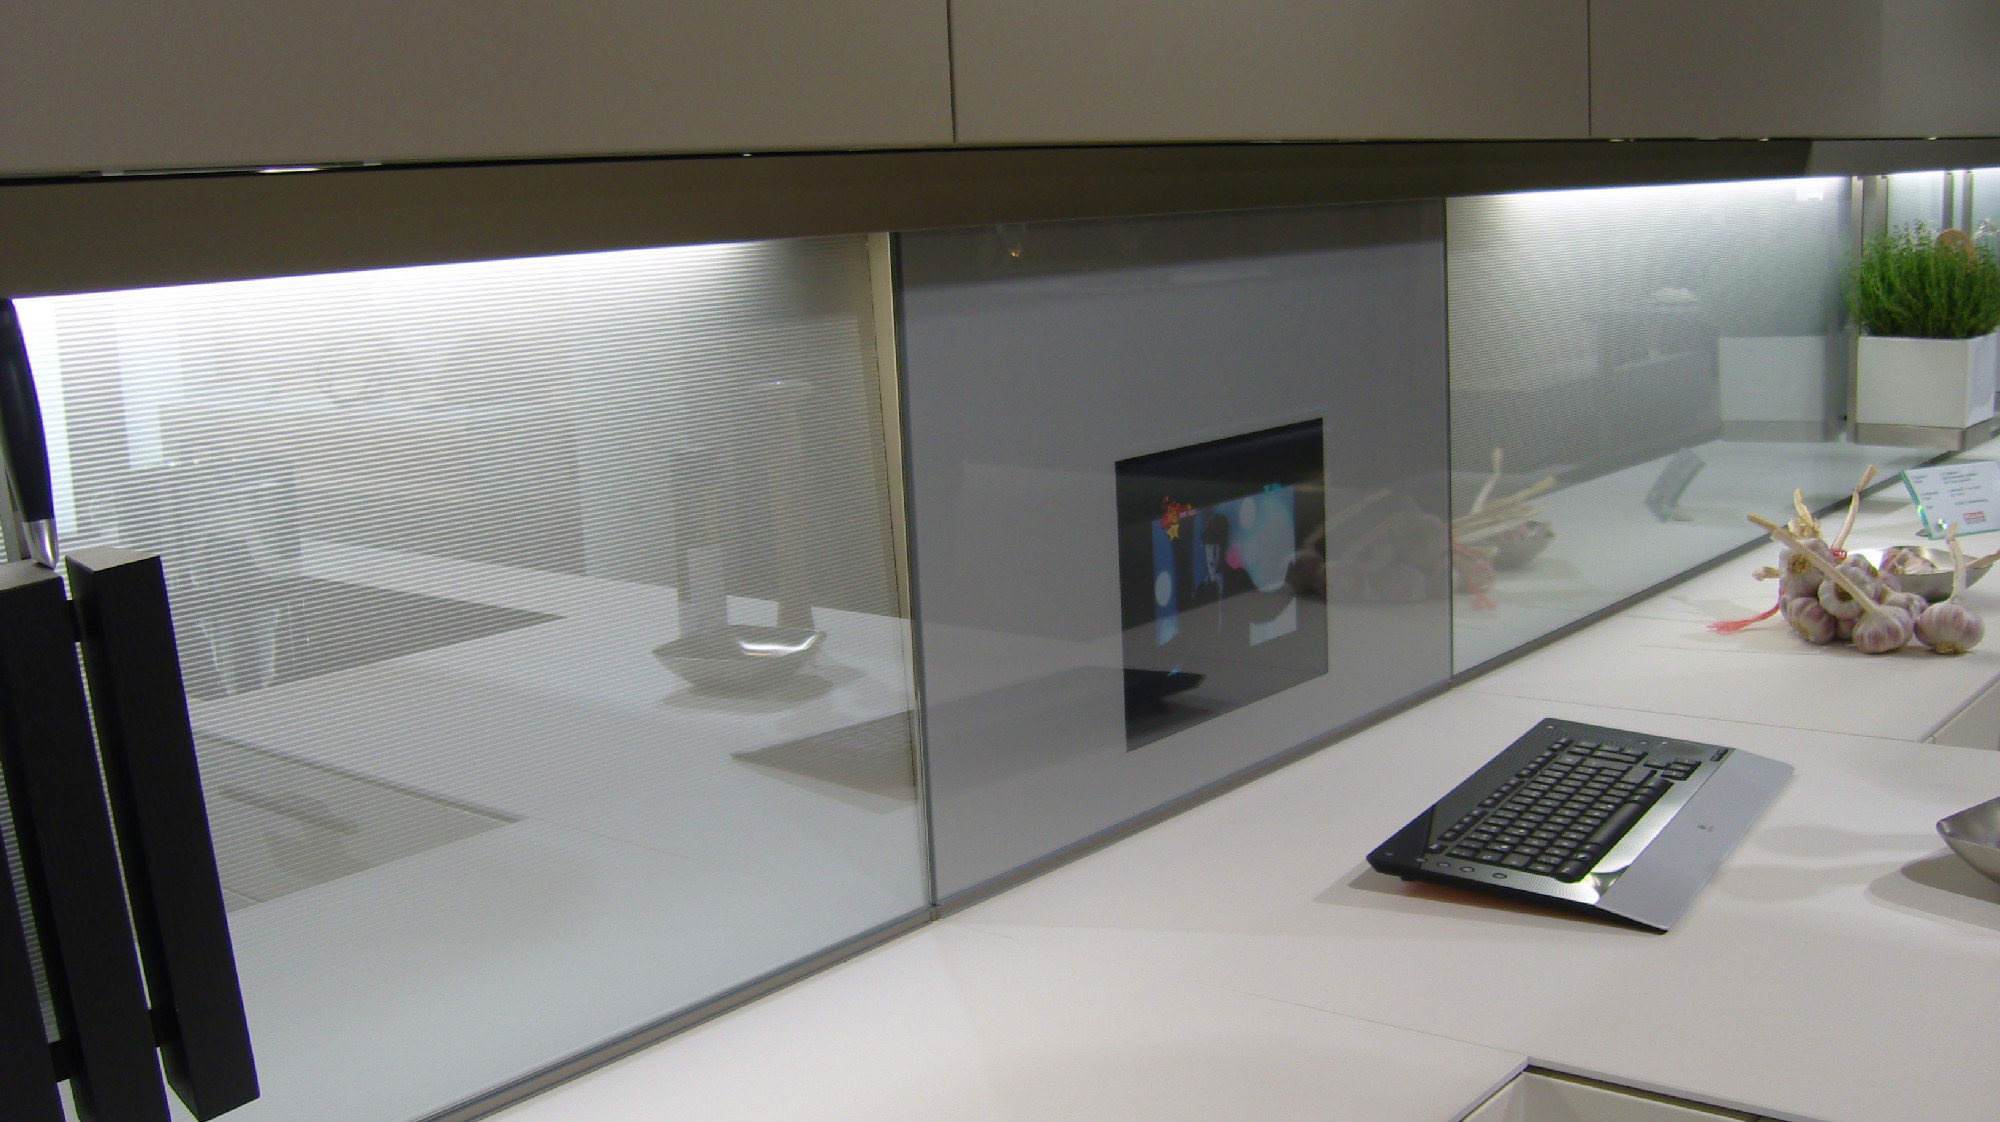 mirror tv residence kitchen